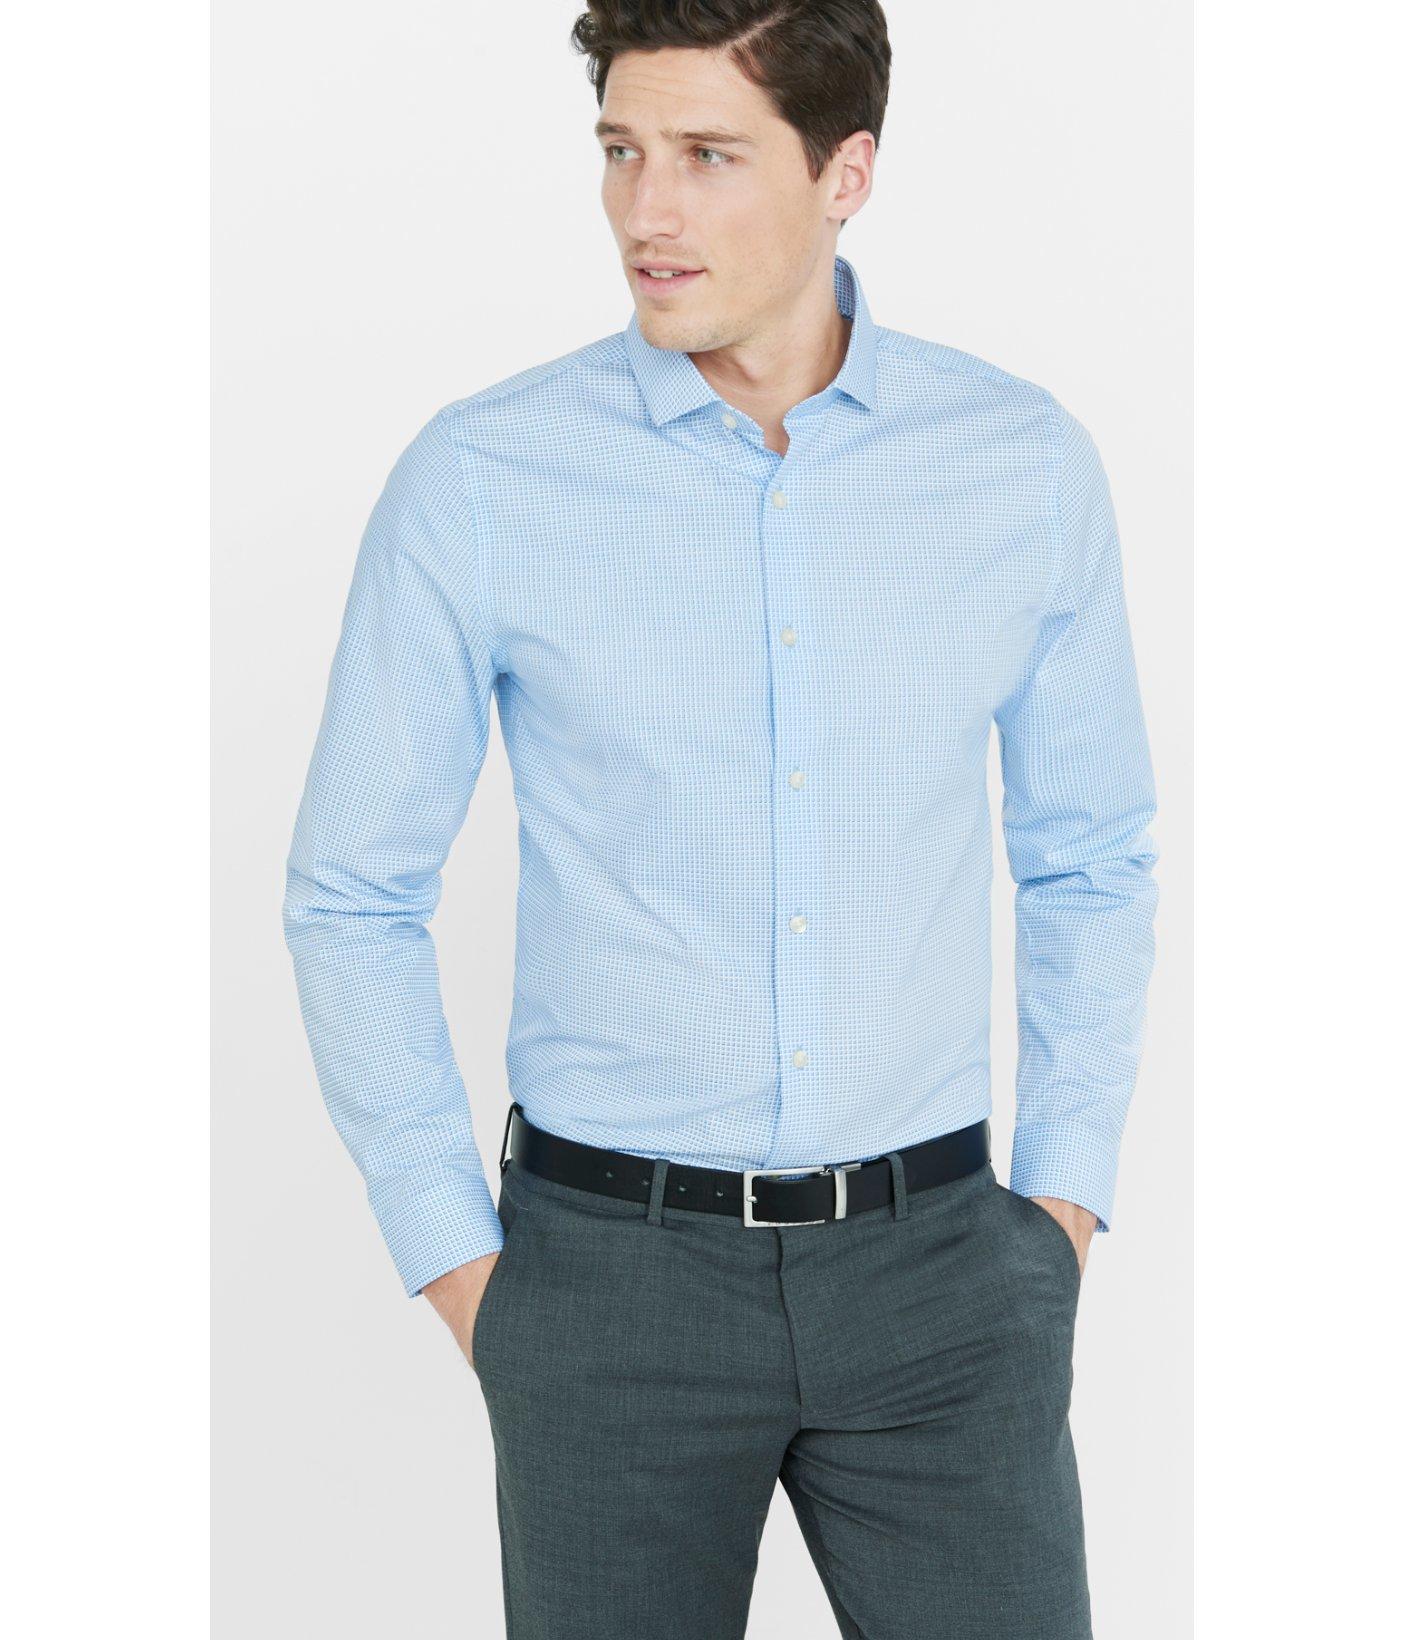 Lyst Express Slim Micro Cube Print Dress Shirt In Blue For Men